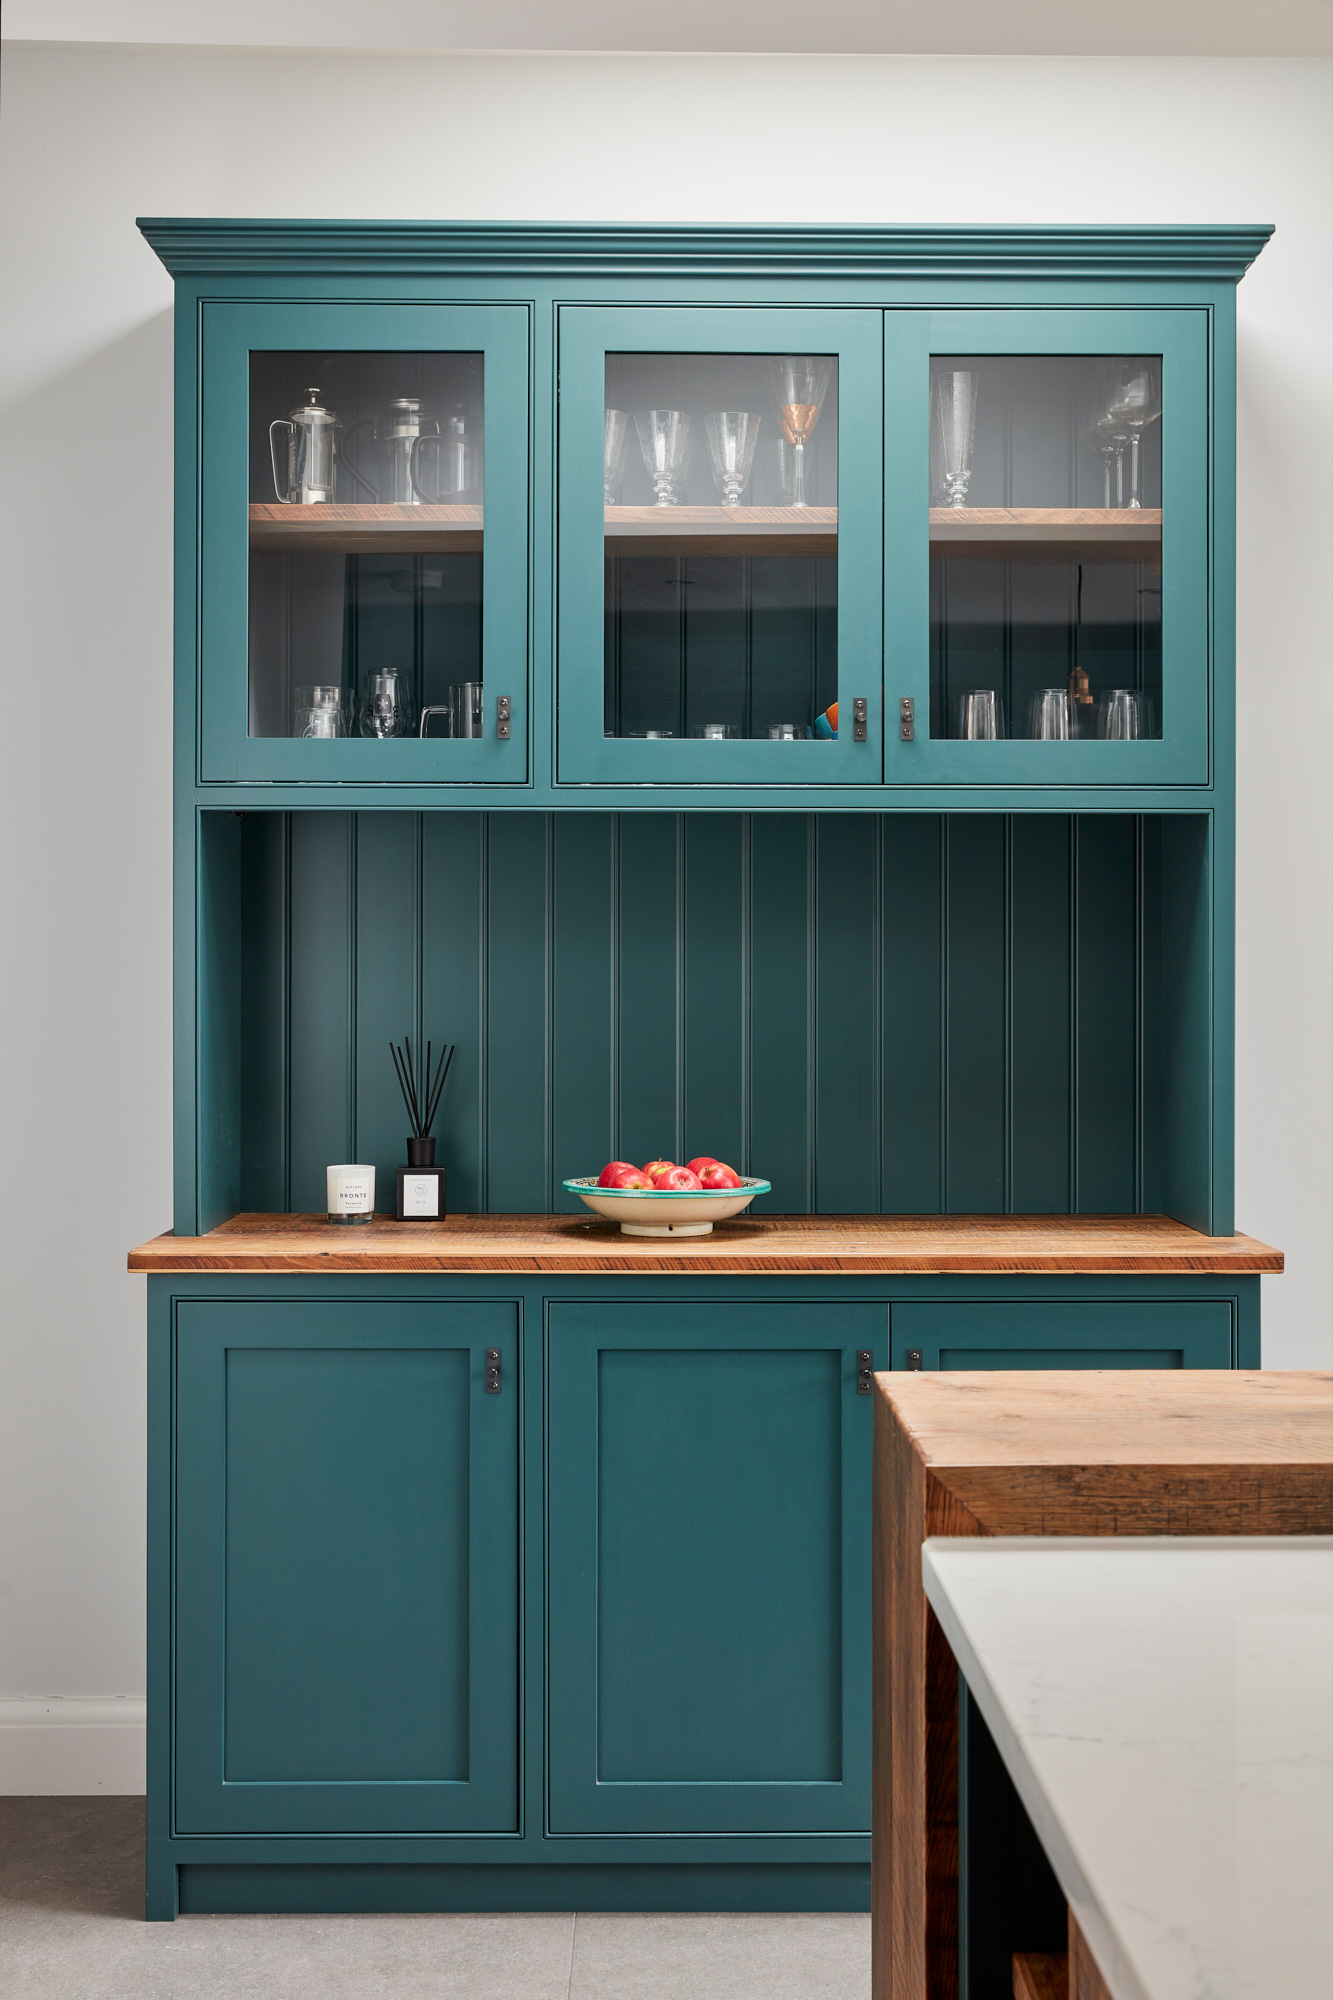 Teal Little Greene painted dresser with oak worktop